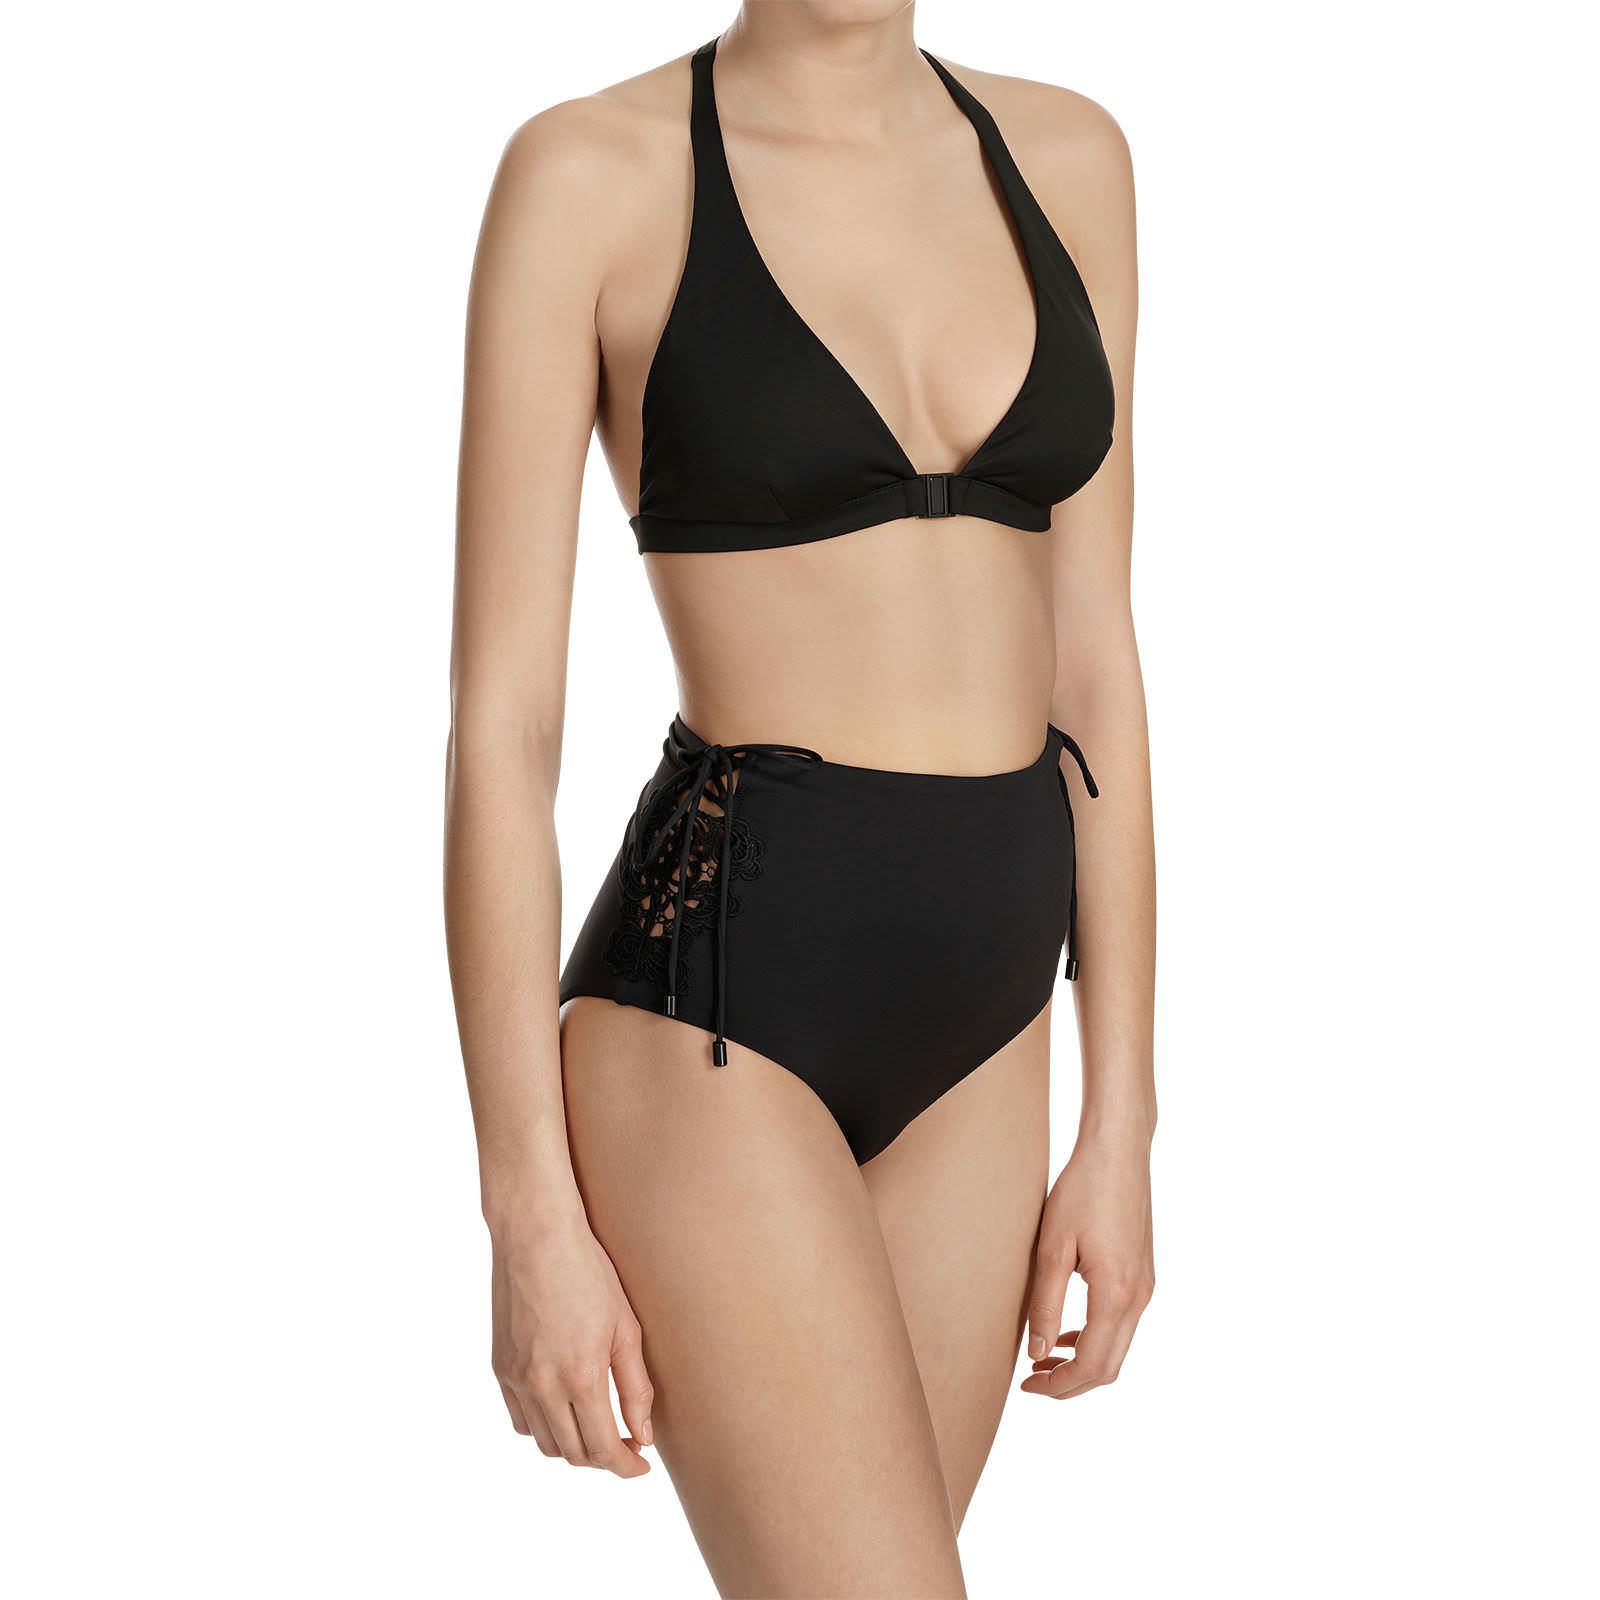 bikini unterteil bali in schwarz bademode bikini hose slip. Black Bedroom Furniture Sets. Home Design Ideas